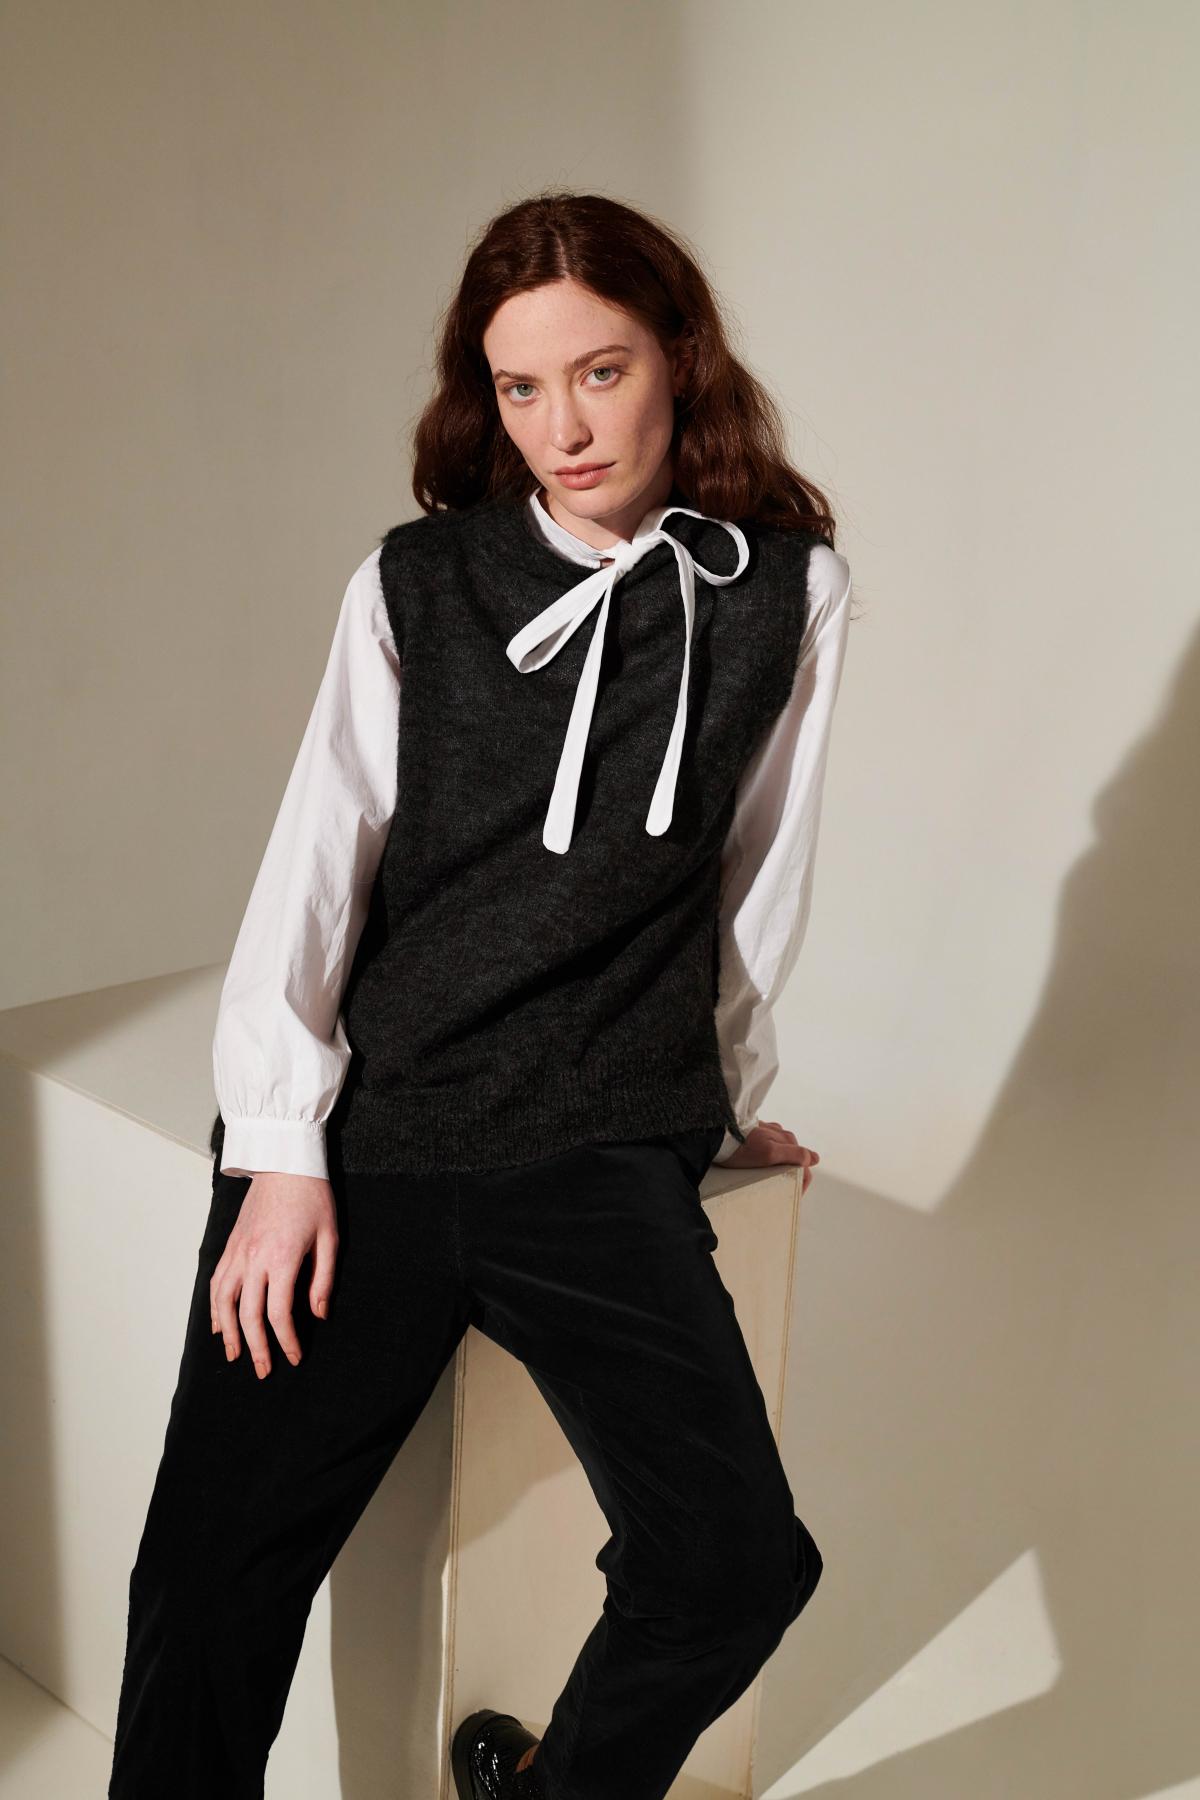 style TIGLIOJRIG tshirt  style PENSOF trouser